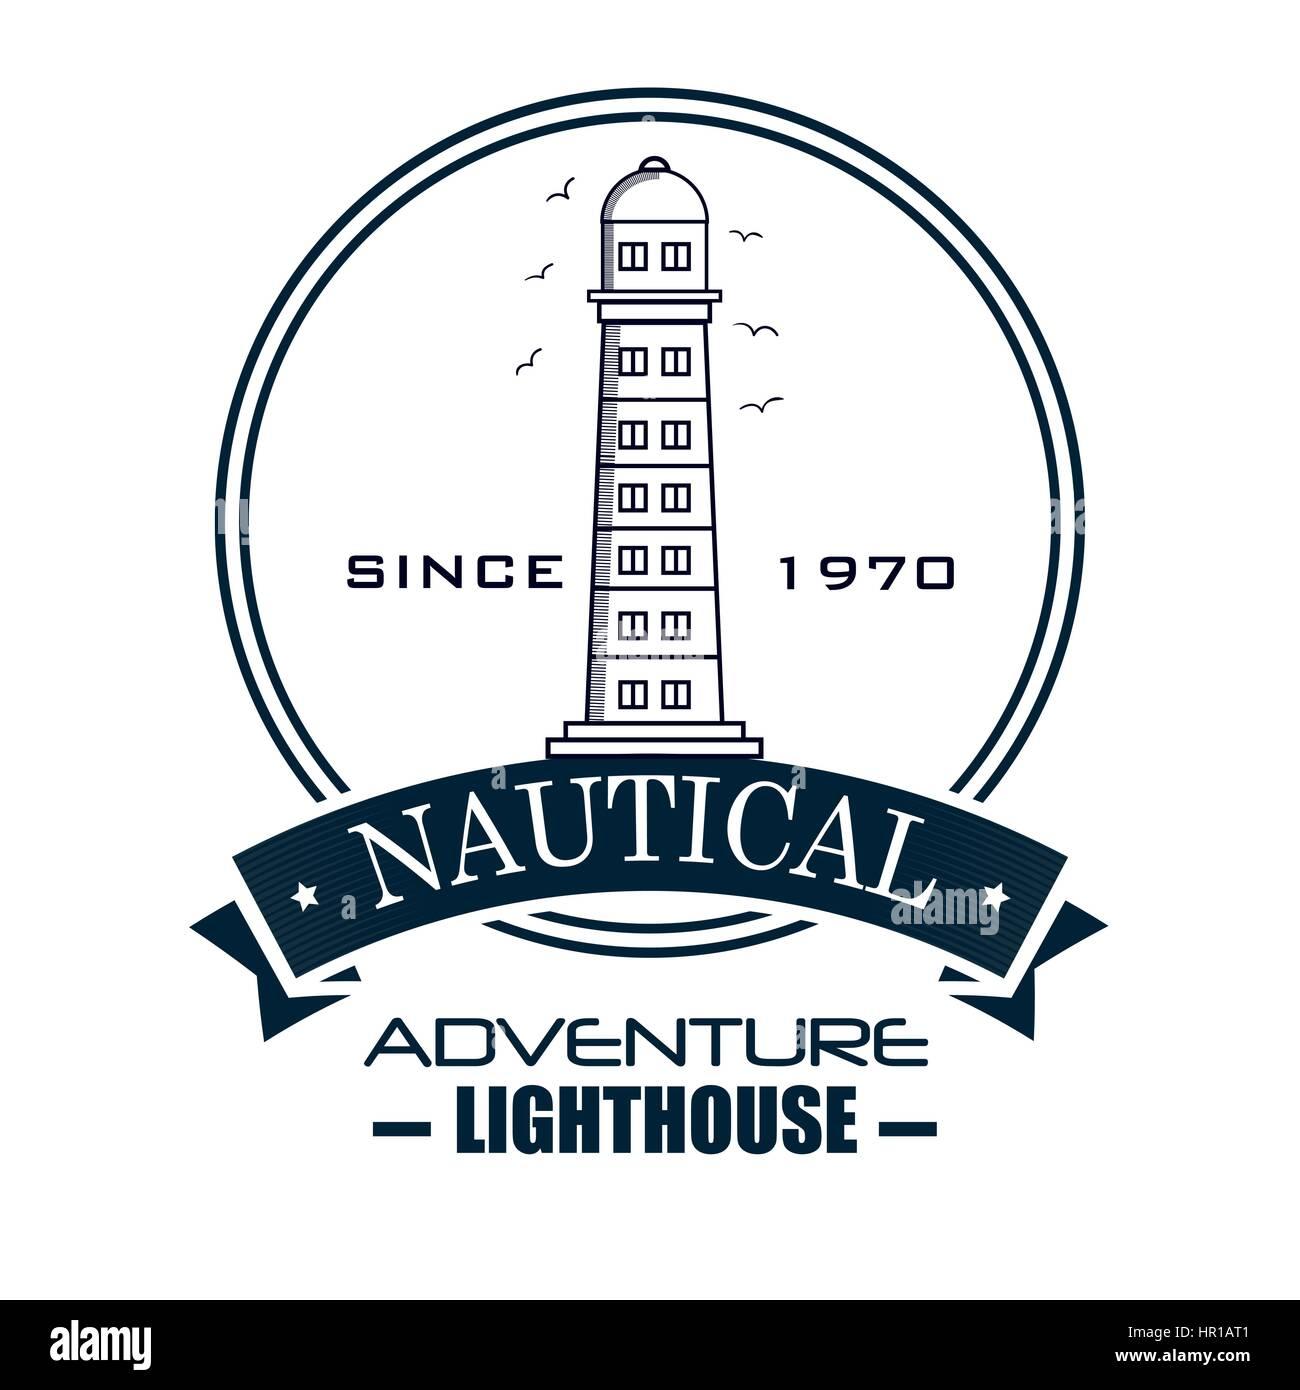 nautical frame with lighthouse - Stock Image